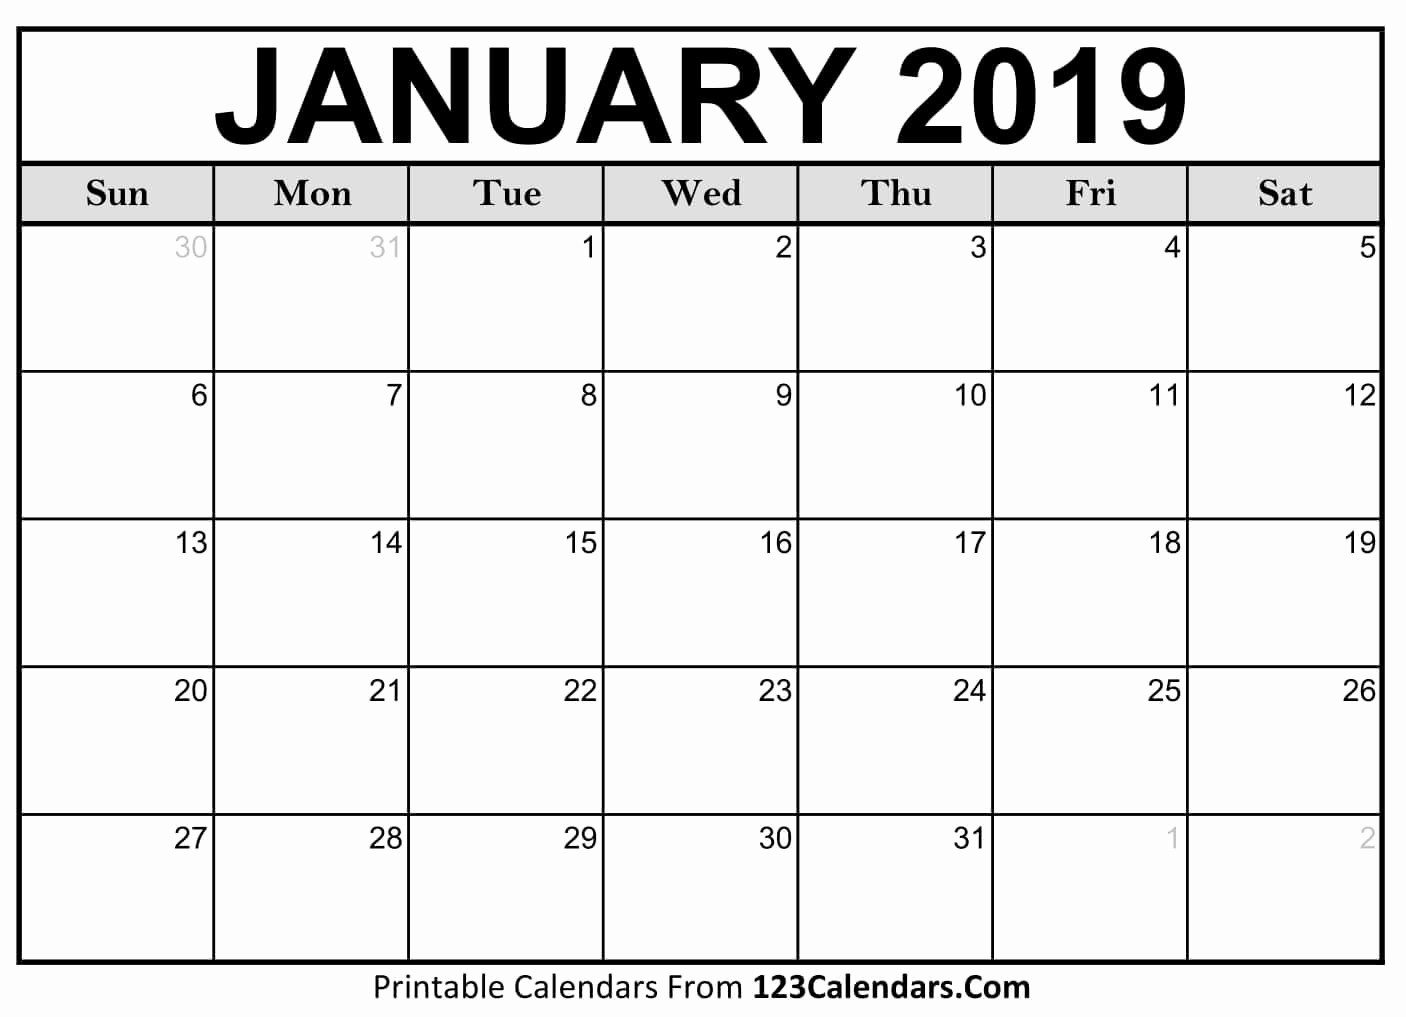 Printable 2018 and 2019 Calendar Awesome Printable 2018 Calendar 123calendars